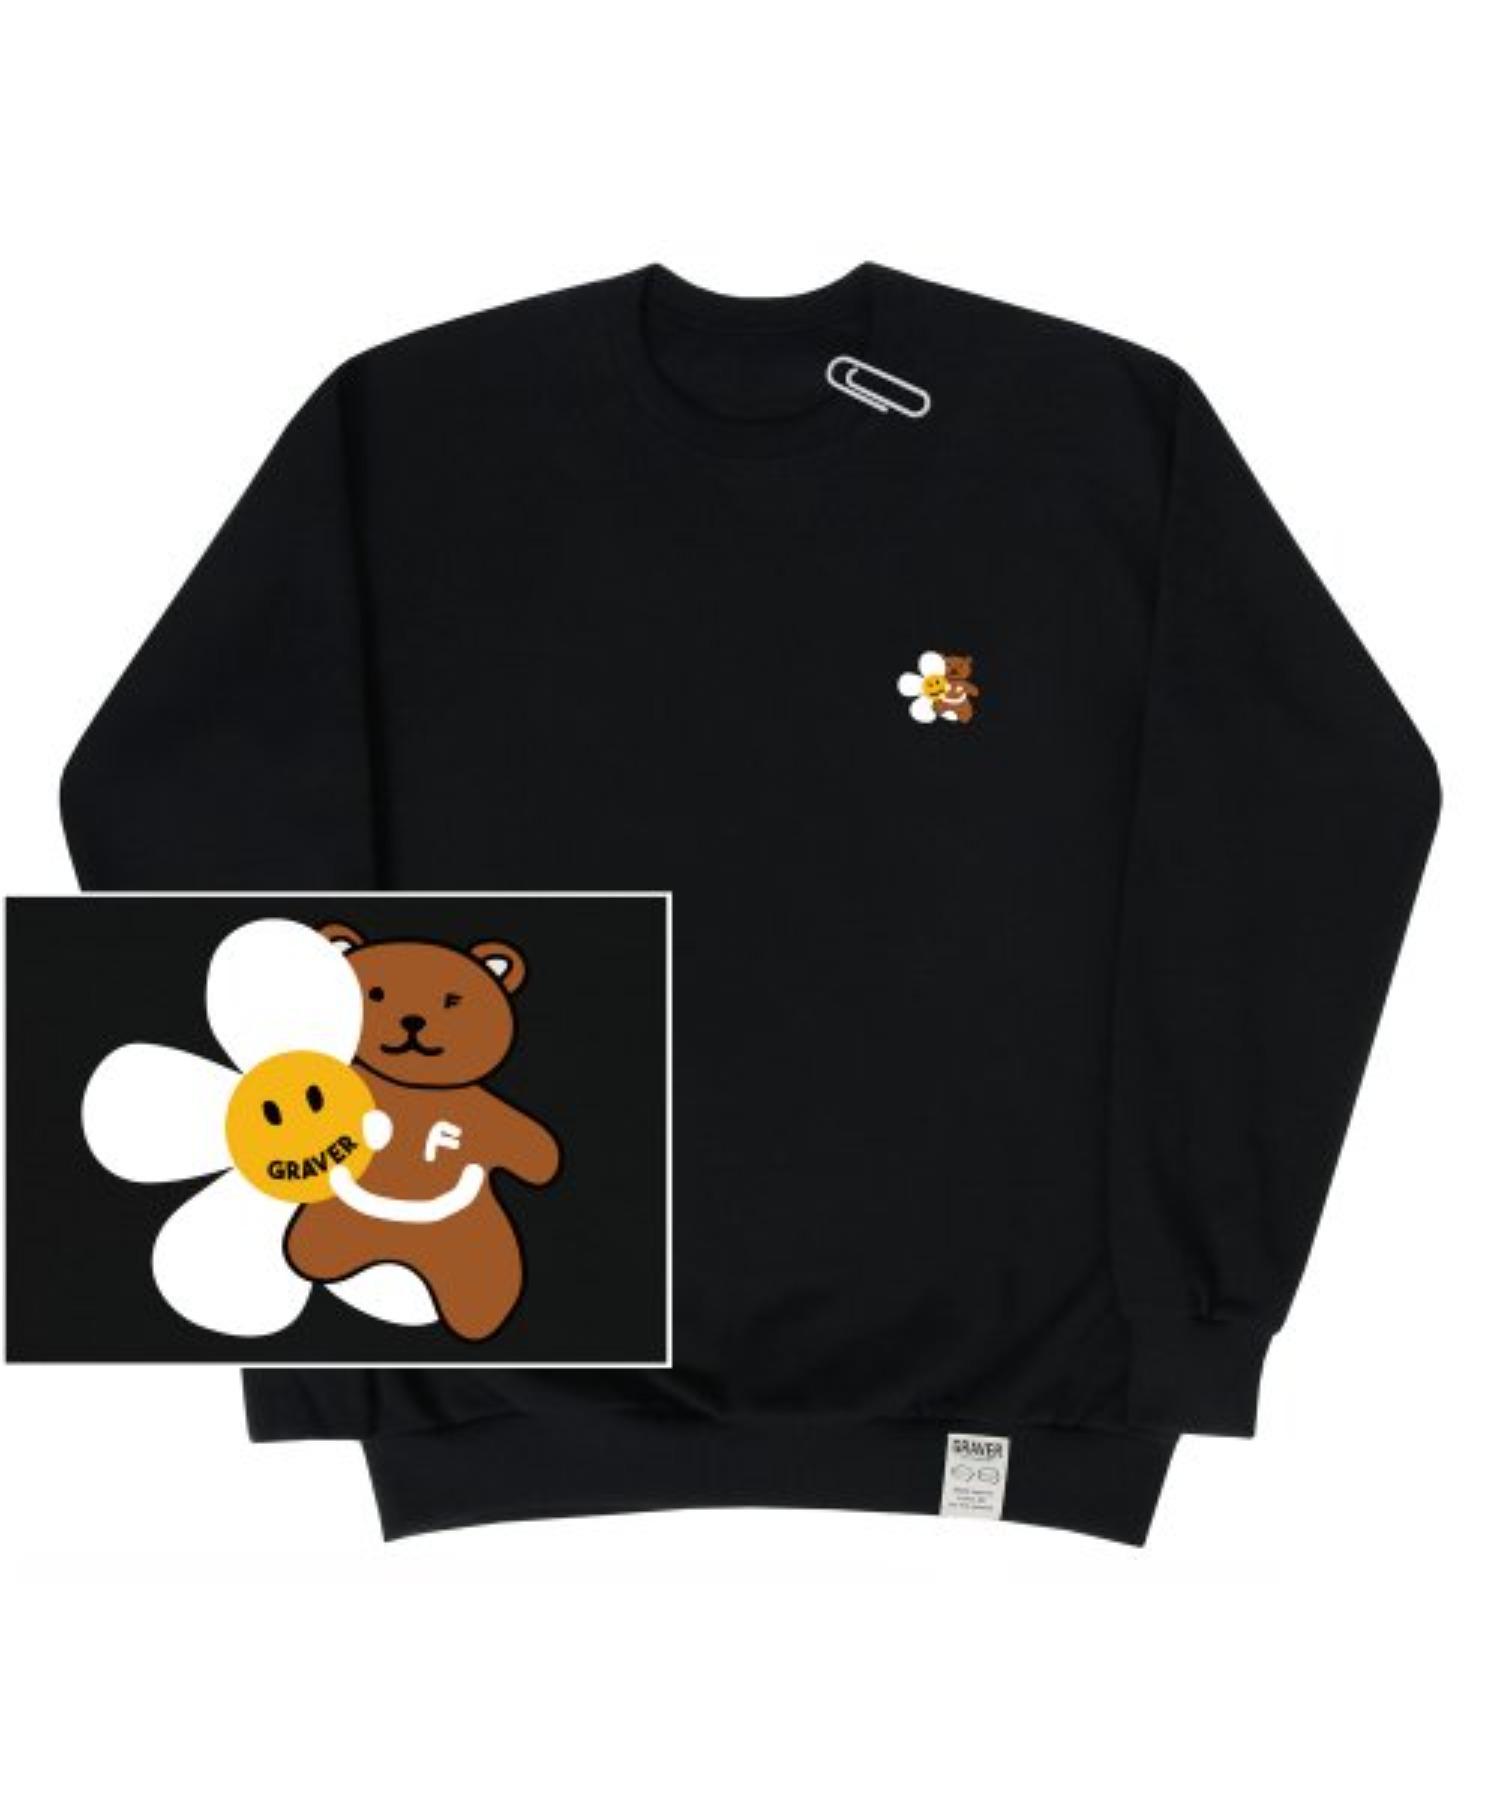 [UNISEX] Small Flower Bear Smile White Clip Sweatshirt_Black